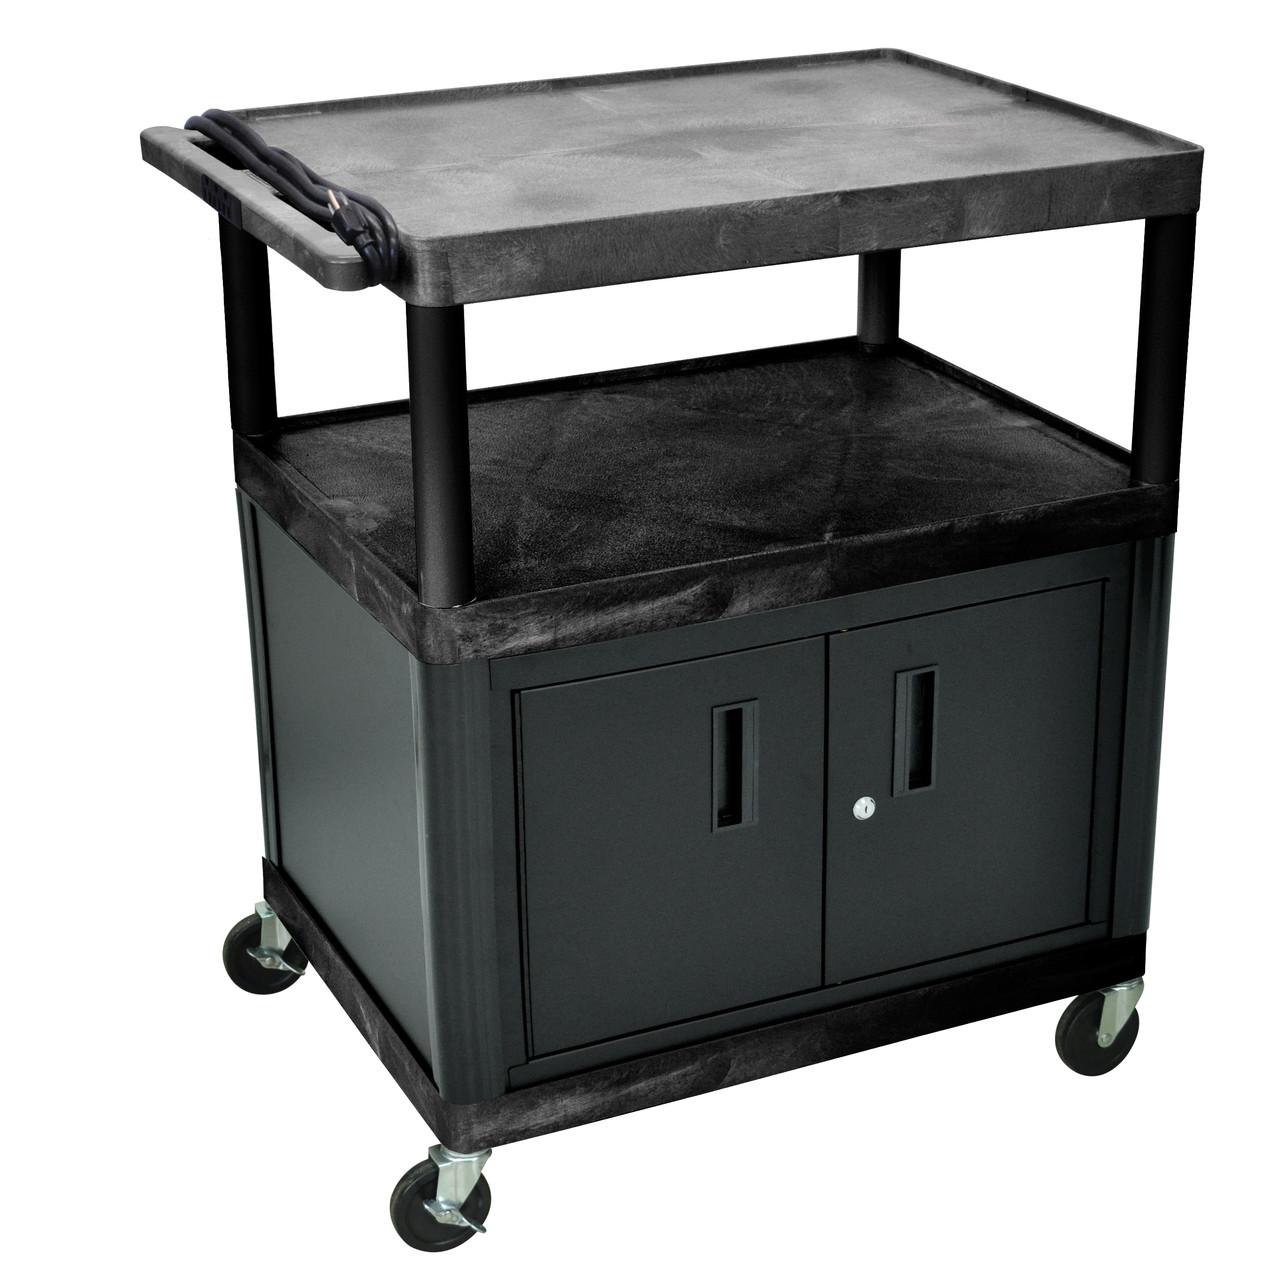 Luxor Endura Black 3 Shelf Presentation Cart W Cabinet 40 1 4 H Creative Safety Supply